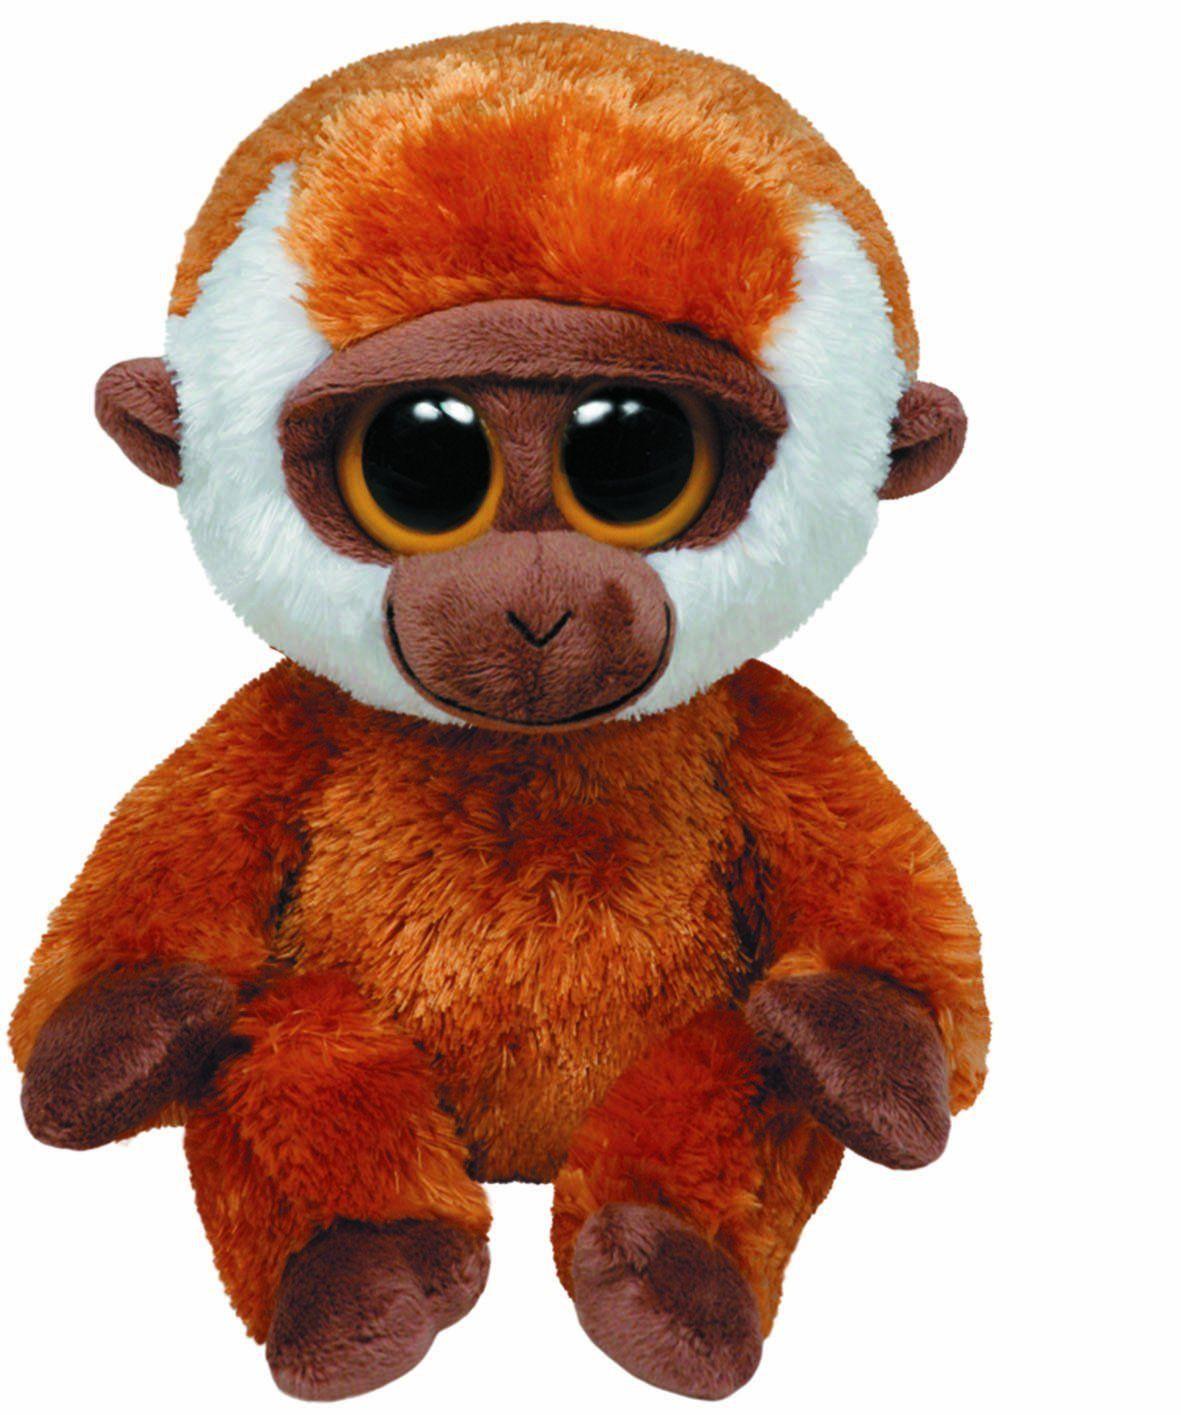 e7bef3eaccd Ty Beanie Boos Bongo Orangutan 6